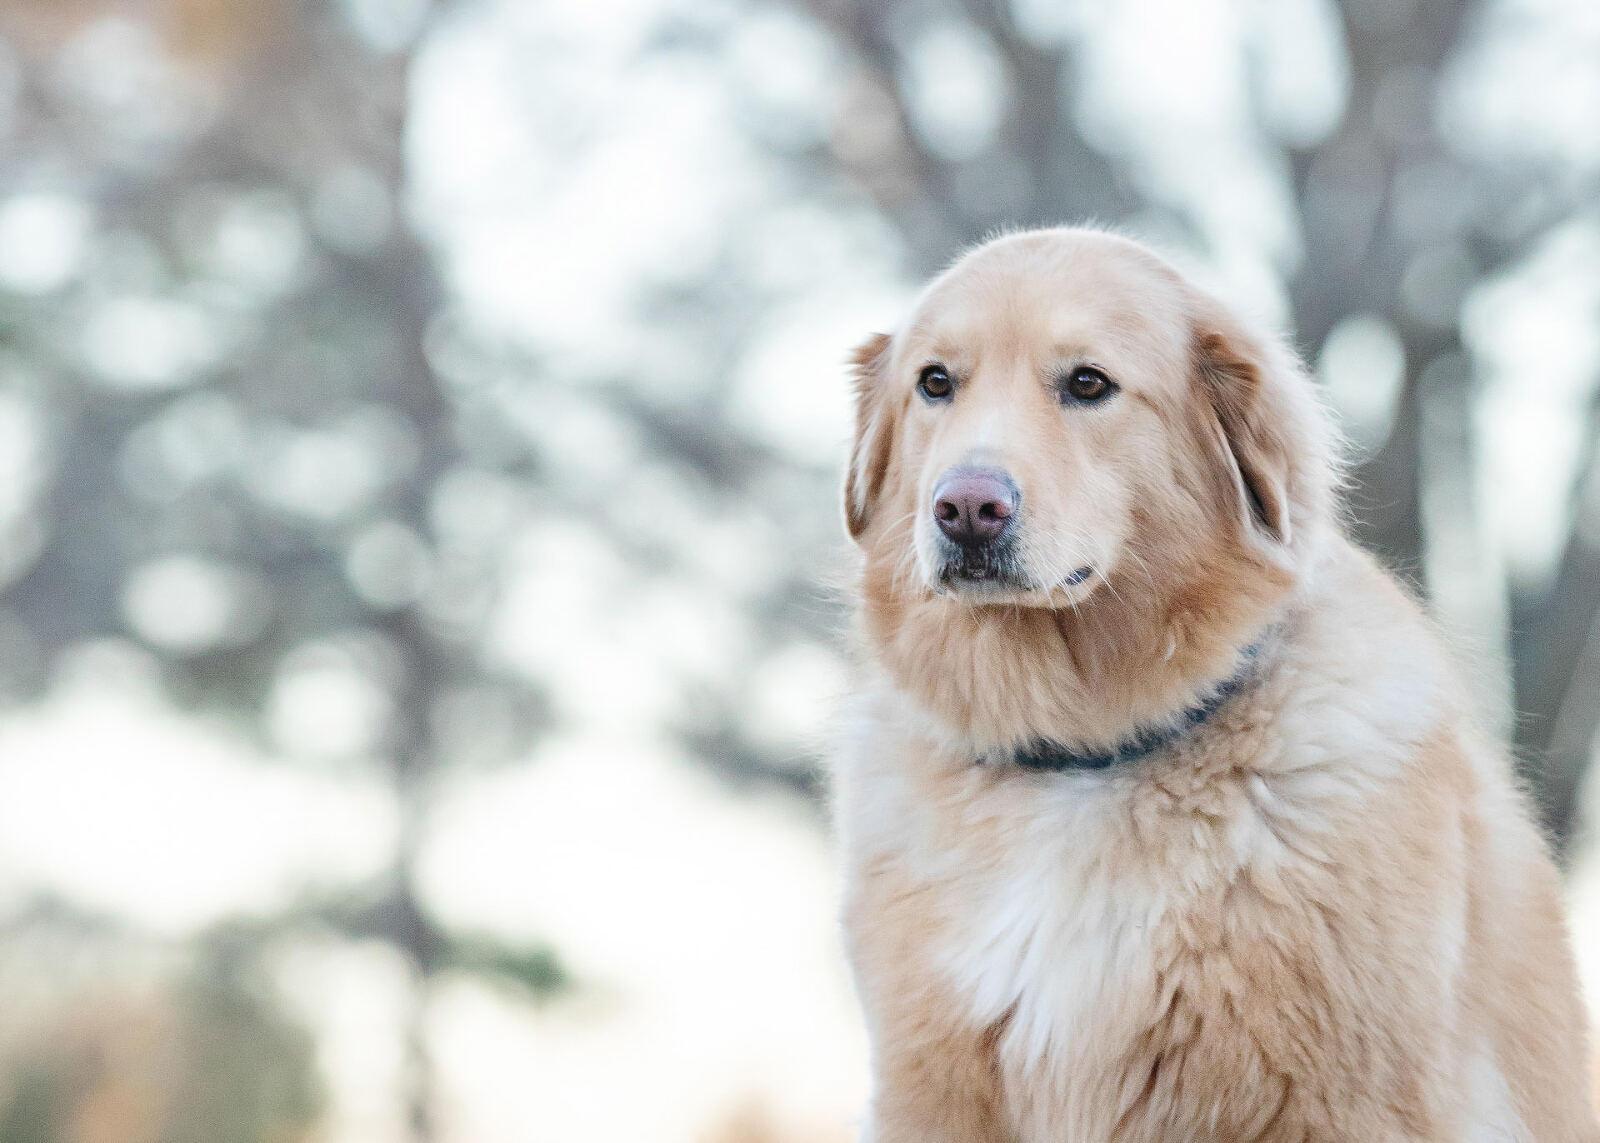 Pet photography portrait by Irene Gardner in Birmingham, Alabama